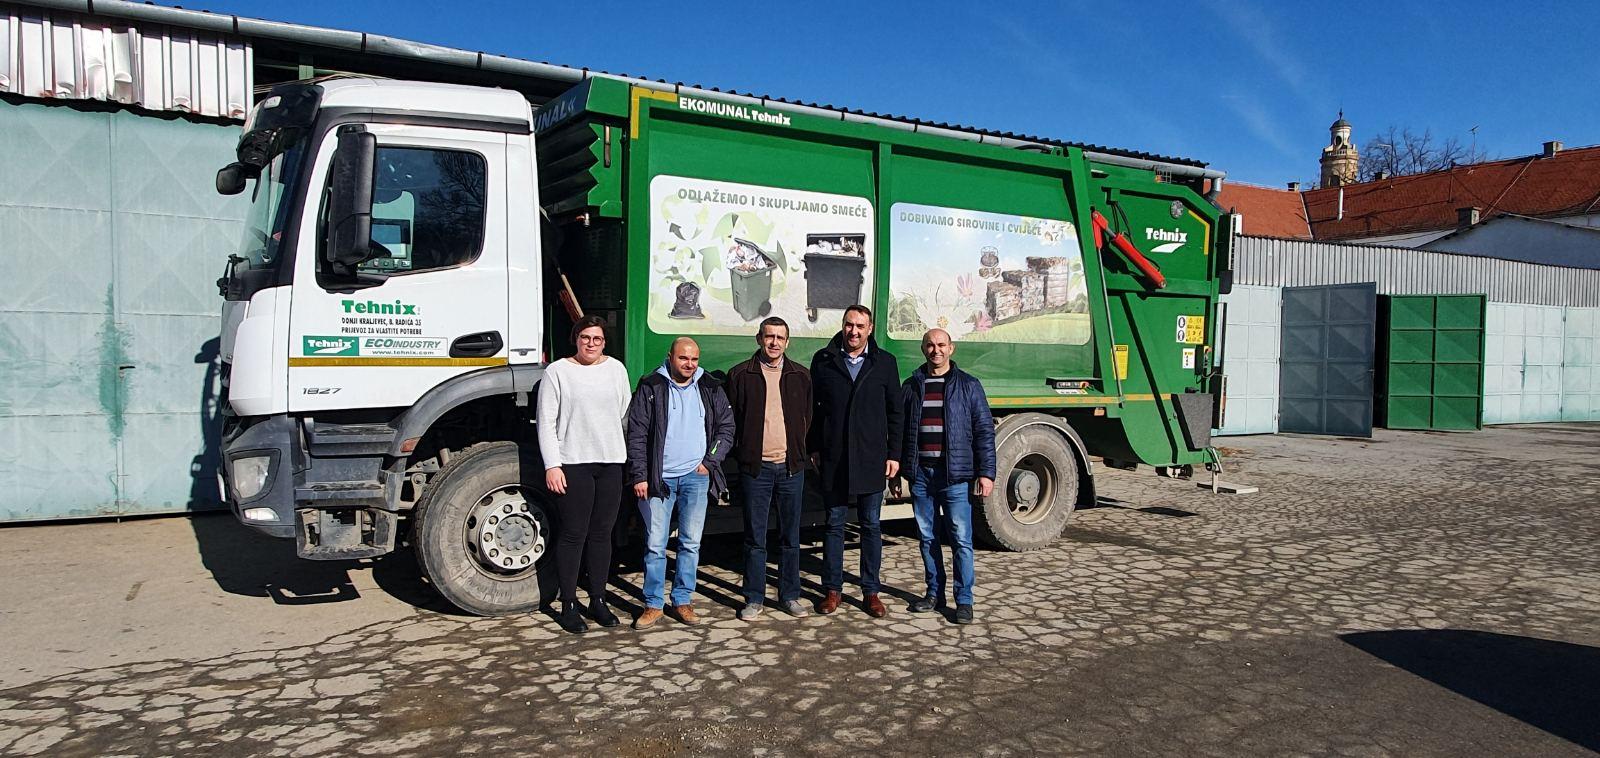 Delivery of utility vehicle EKOMUNAL 16 m3 for Urbanizam d.o.o. Valpovo